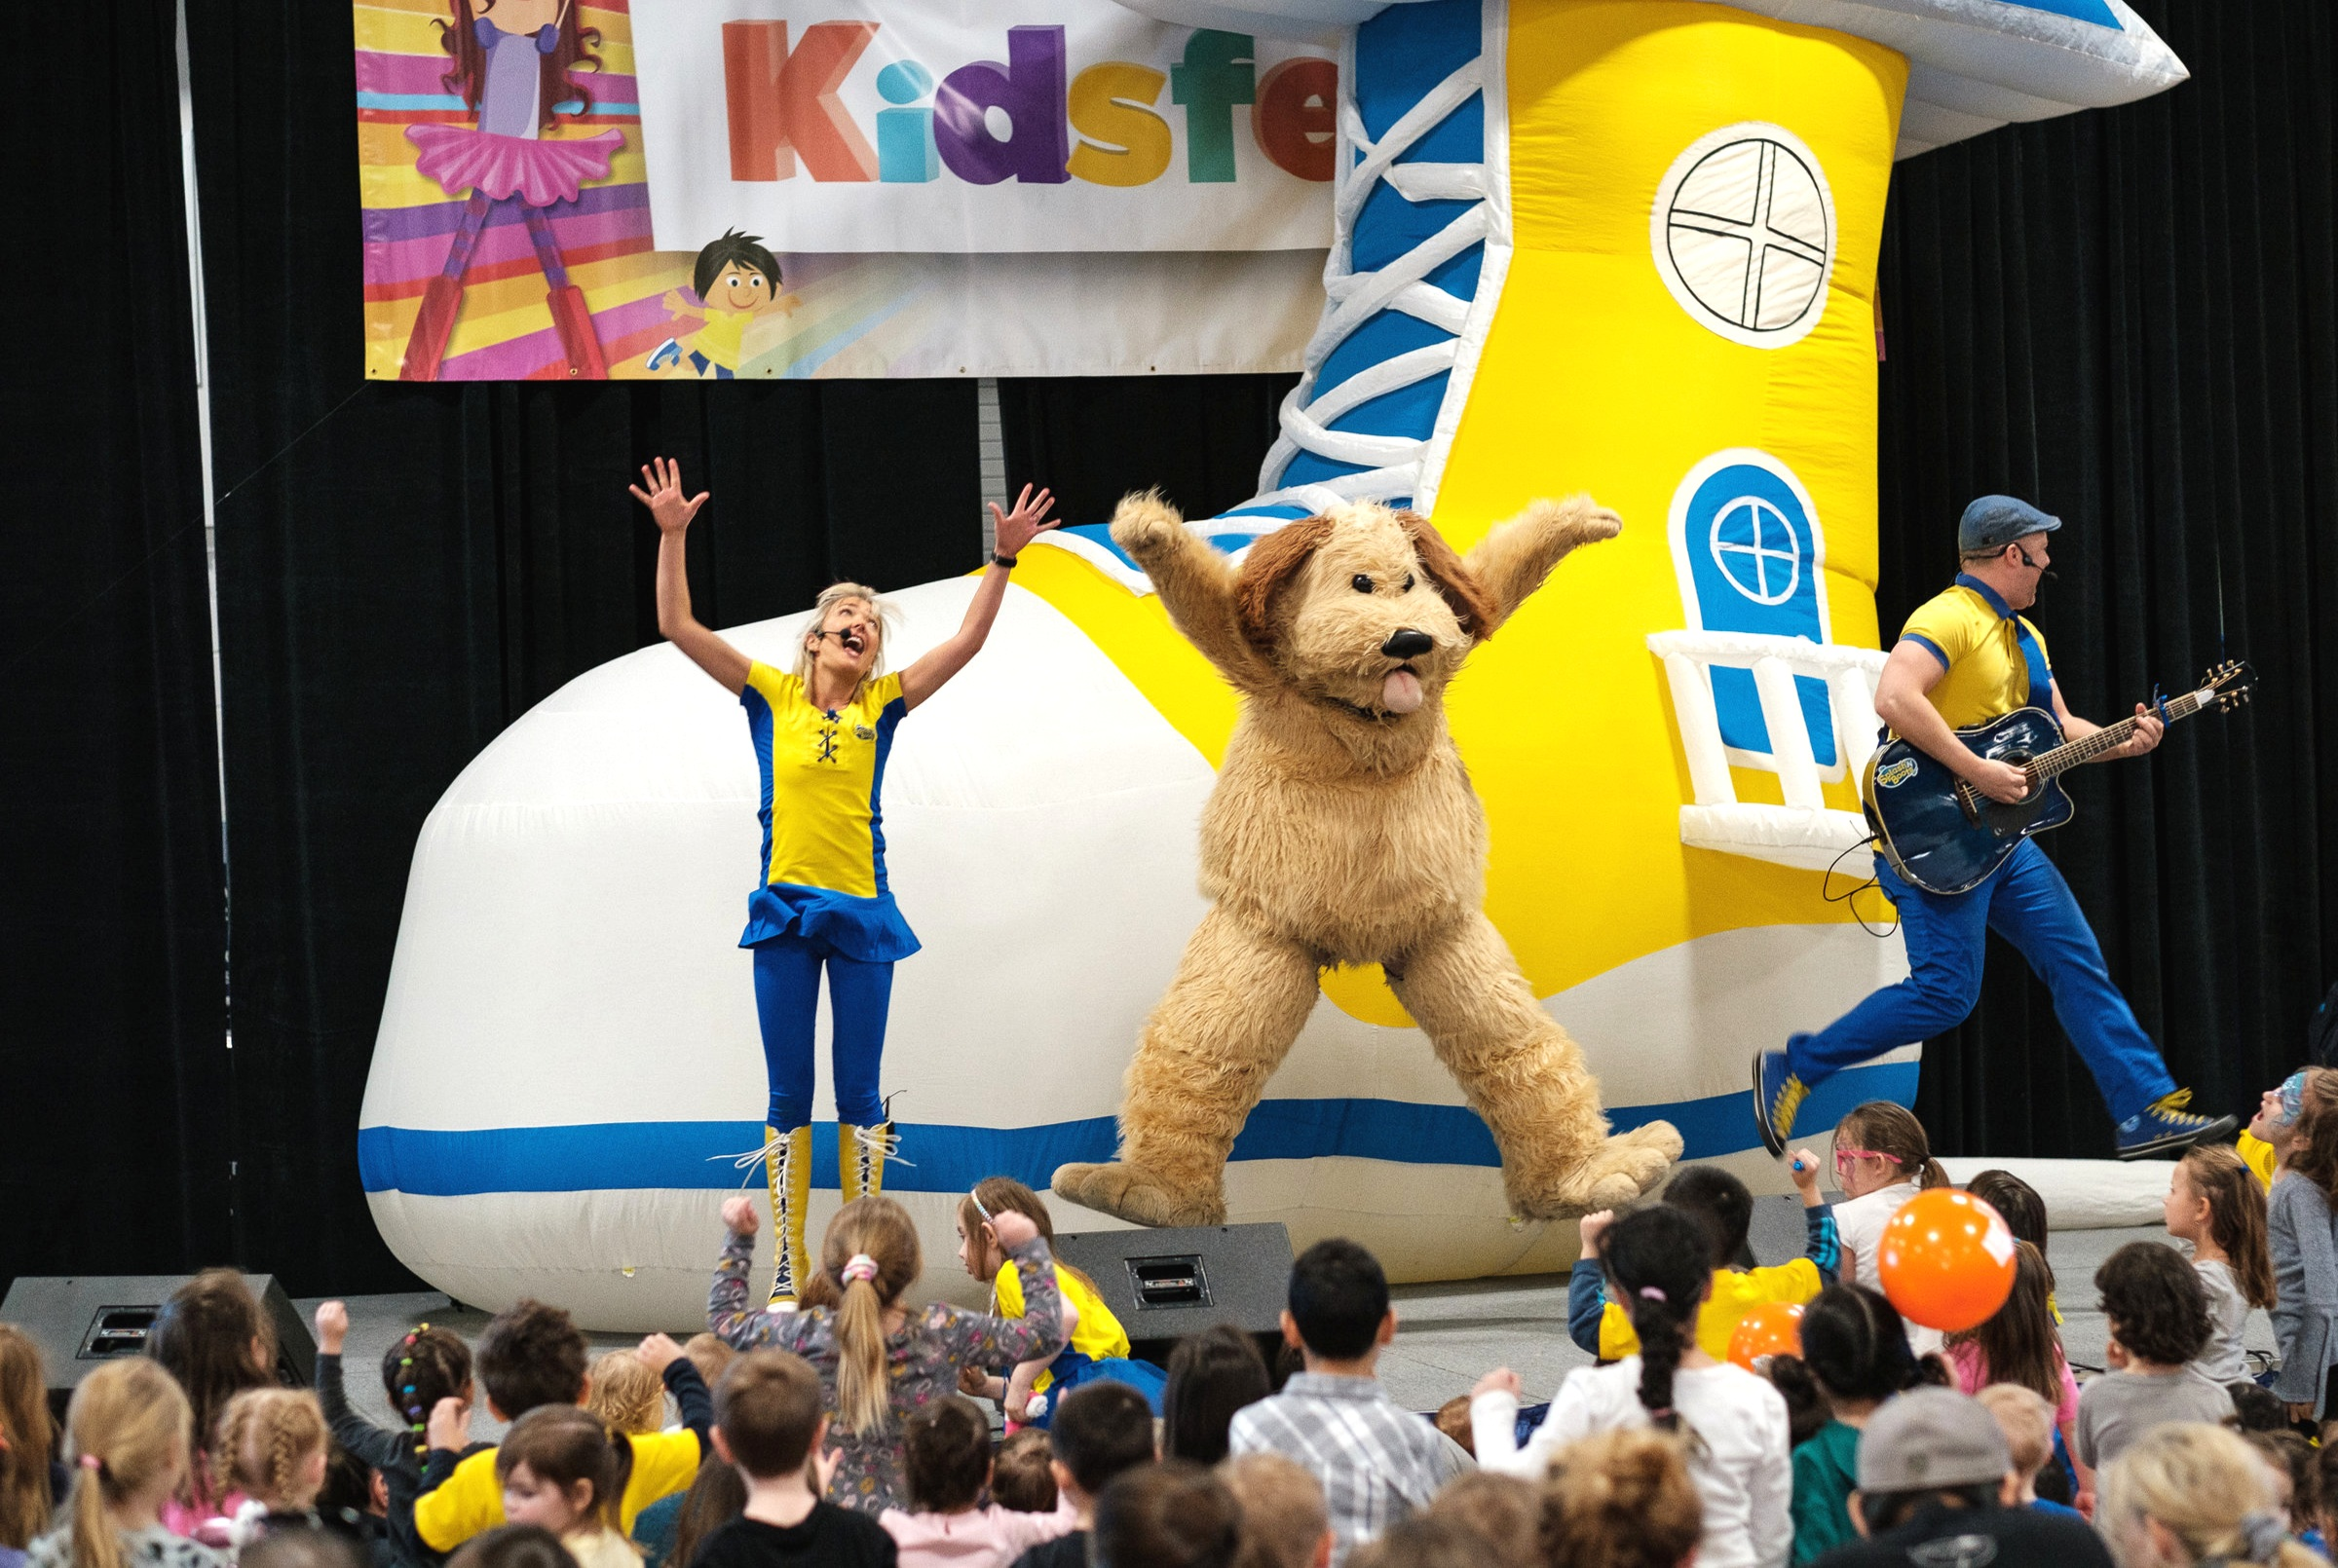 Kidsfest-16.jpg